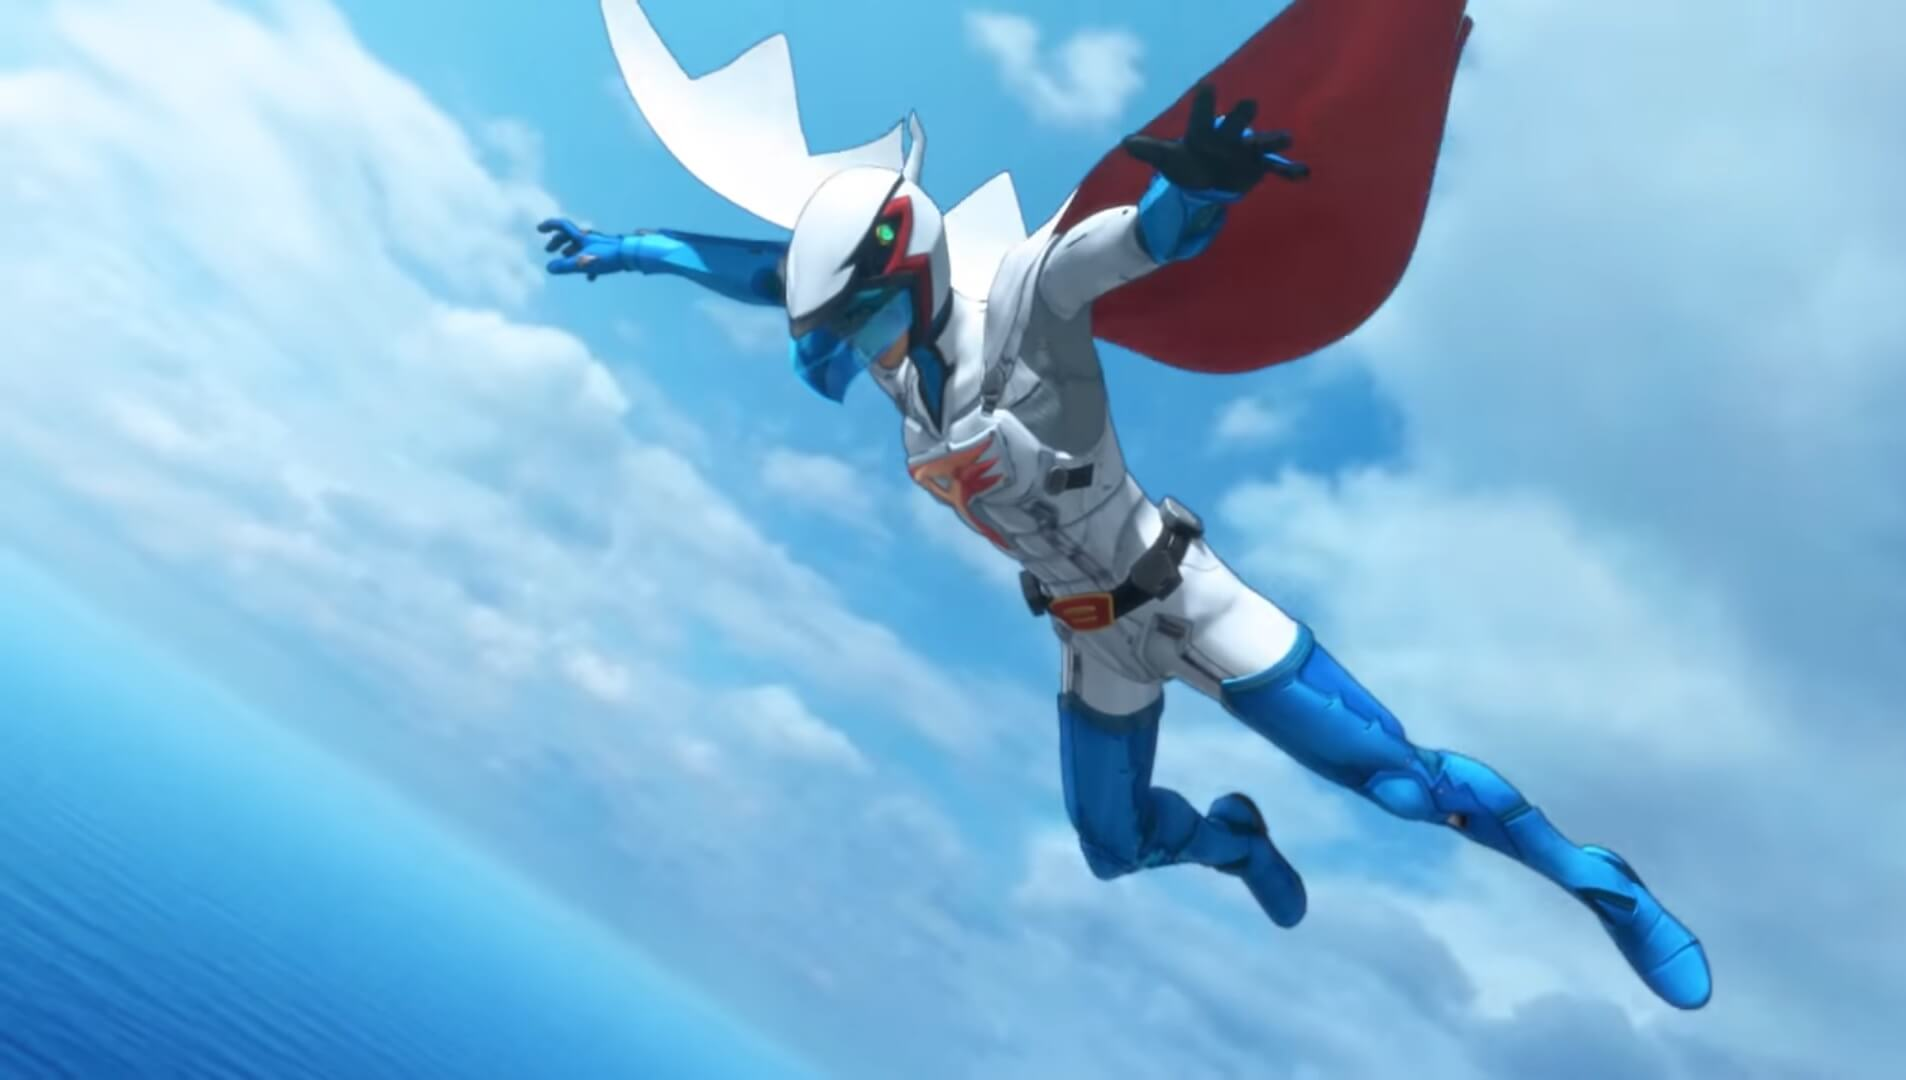 Infini-T Force revela Primeiro Vídeo Promocional